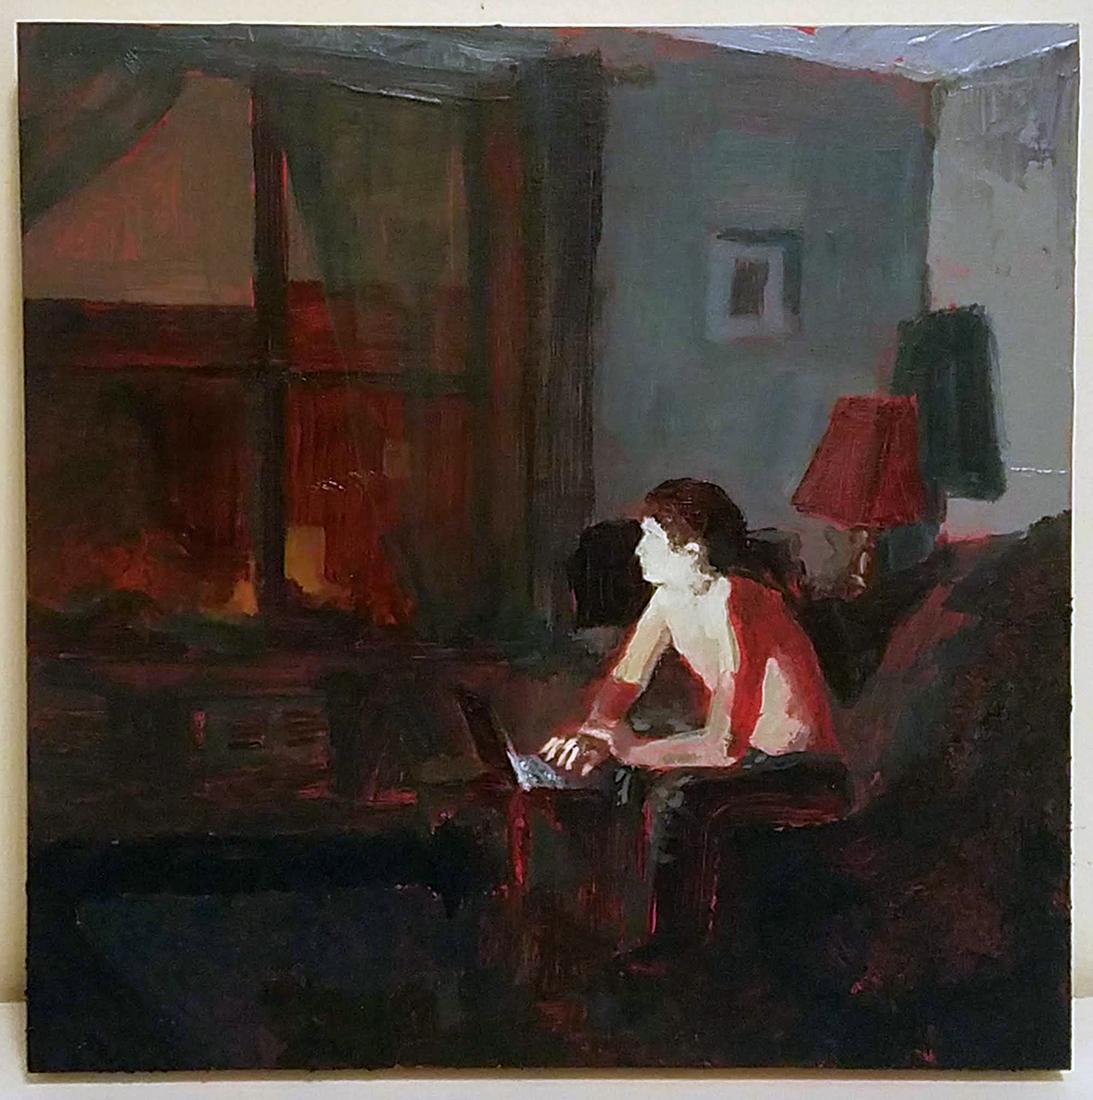 Anna Shukeylo